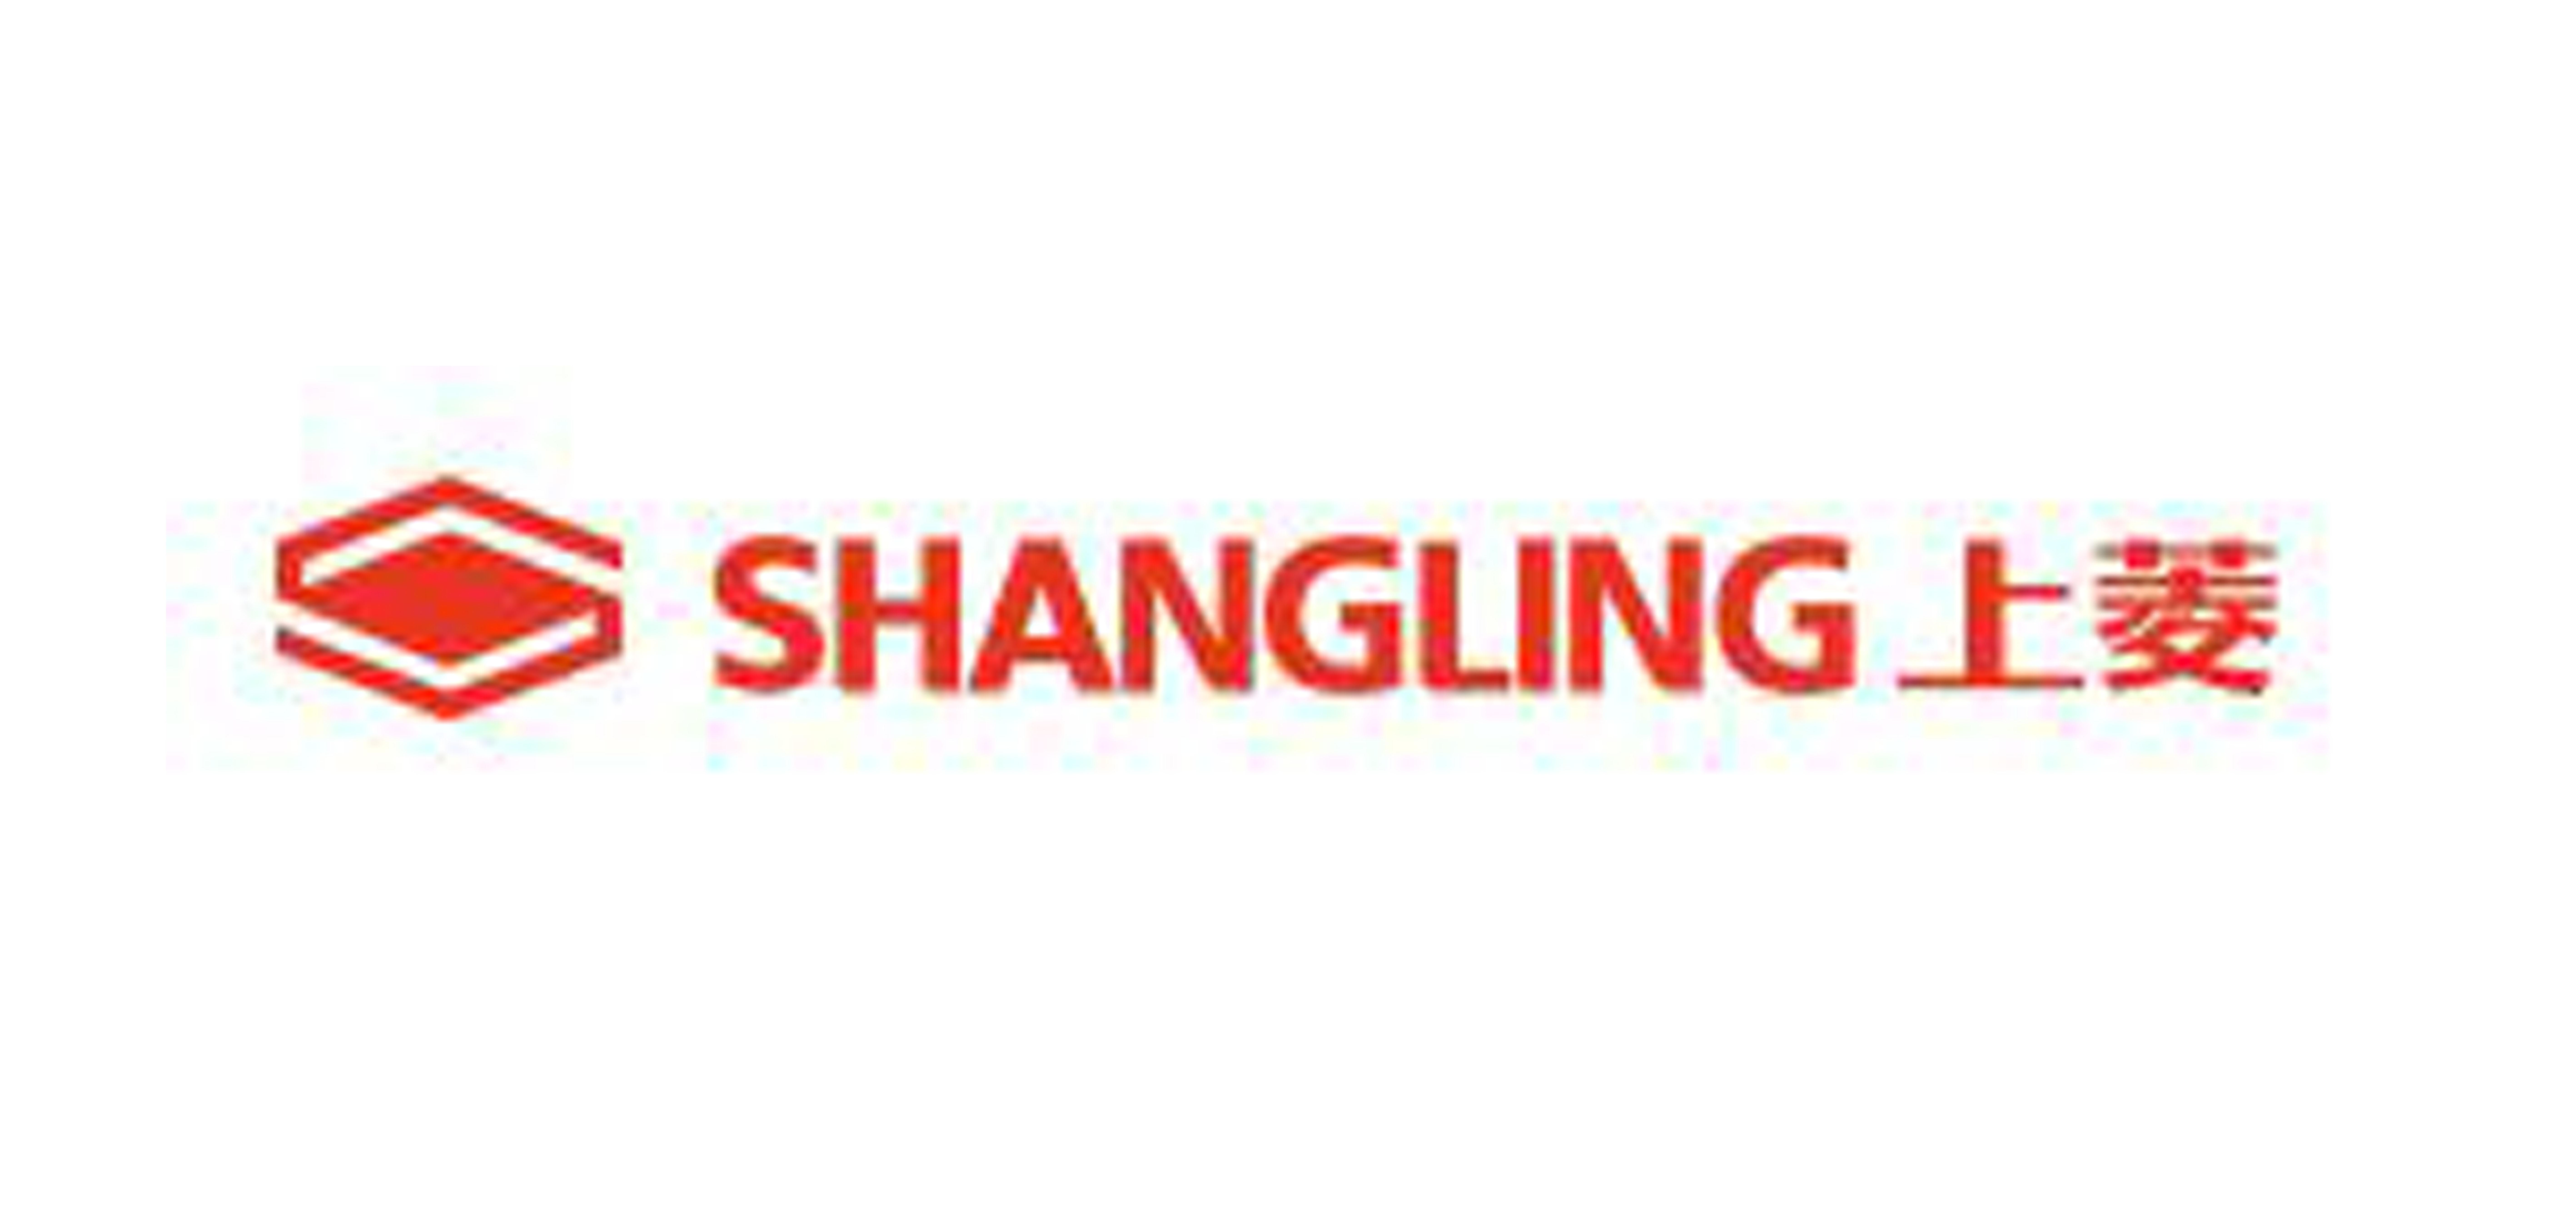 SHANGLING是什么牌子_上菱品牌怎么样?